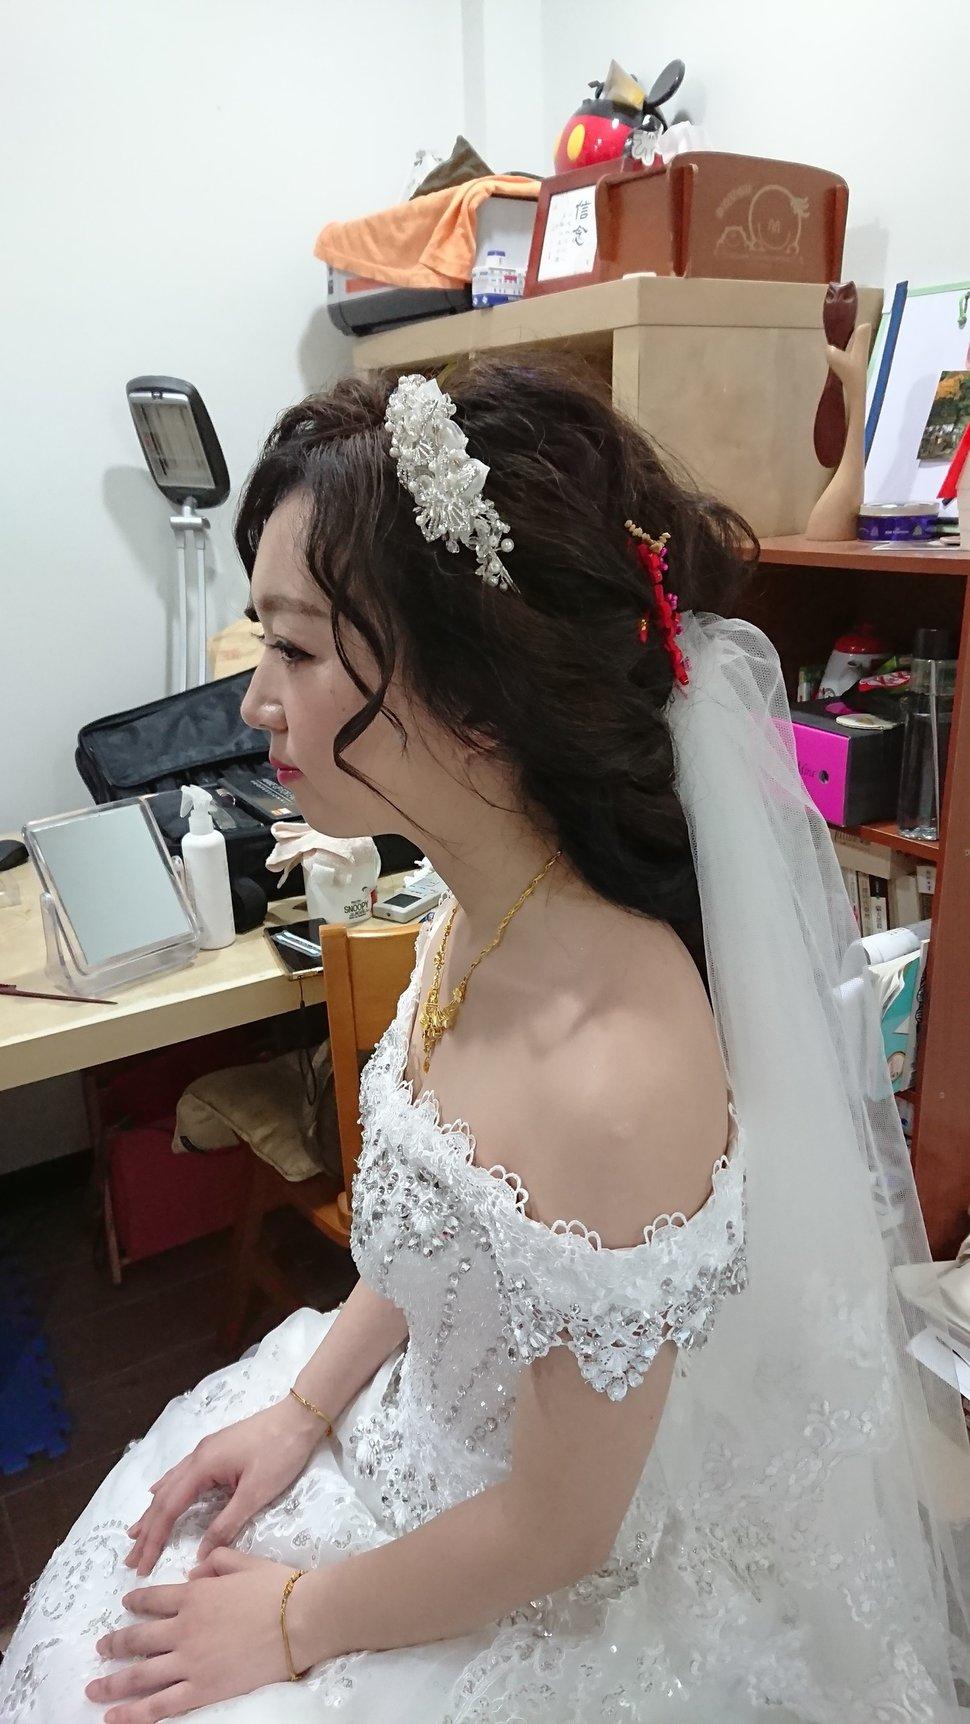 DSC_0376 - 花精靈婚紗∣攝影∣新秘 - 結婚吧